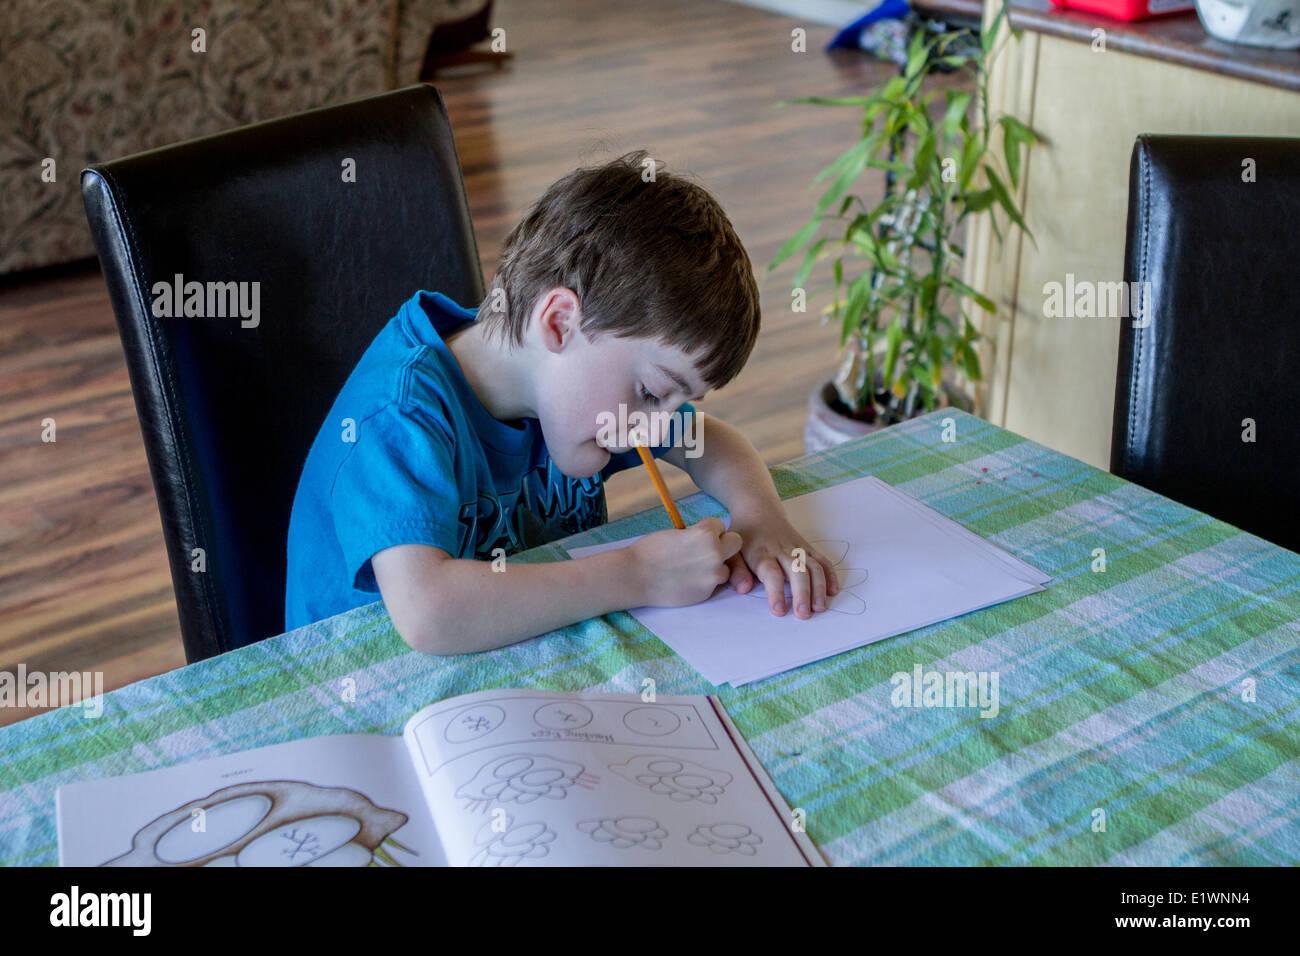 Young boy, tracing and coloring. Cranbrook, British Columbia, Canada. - Stock Image